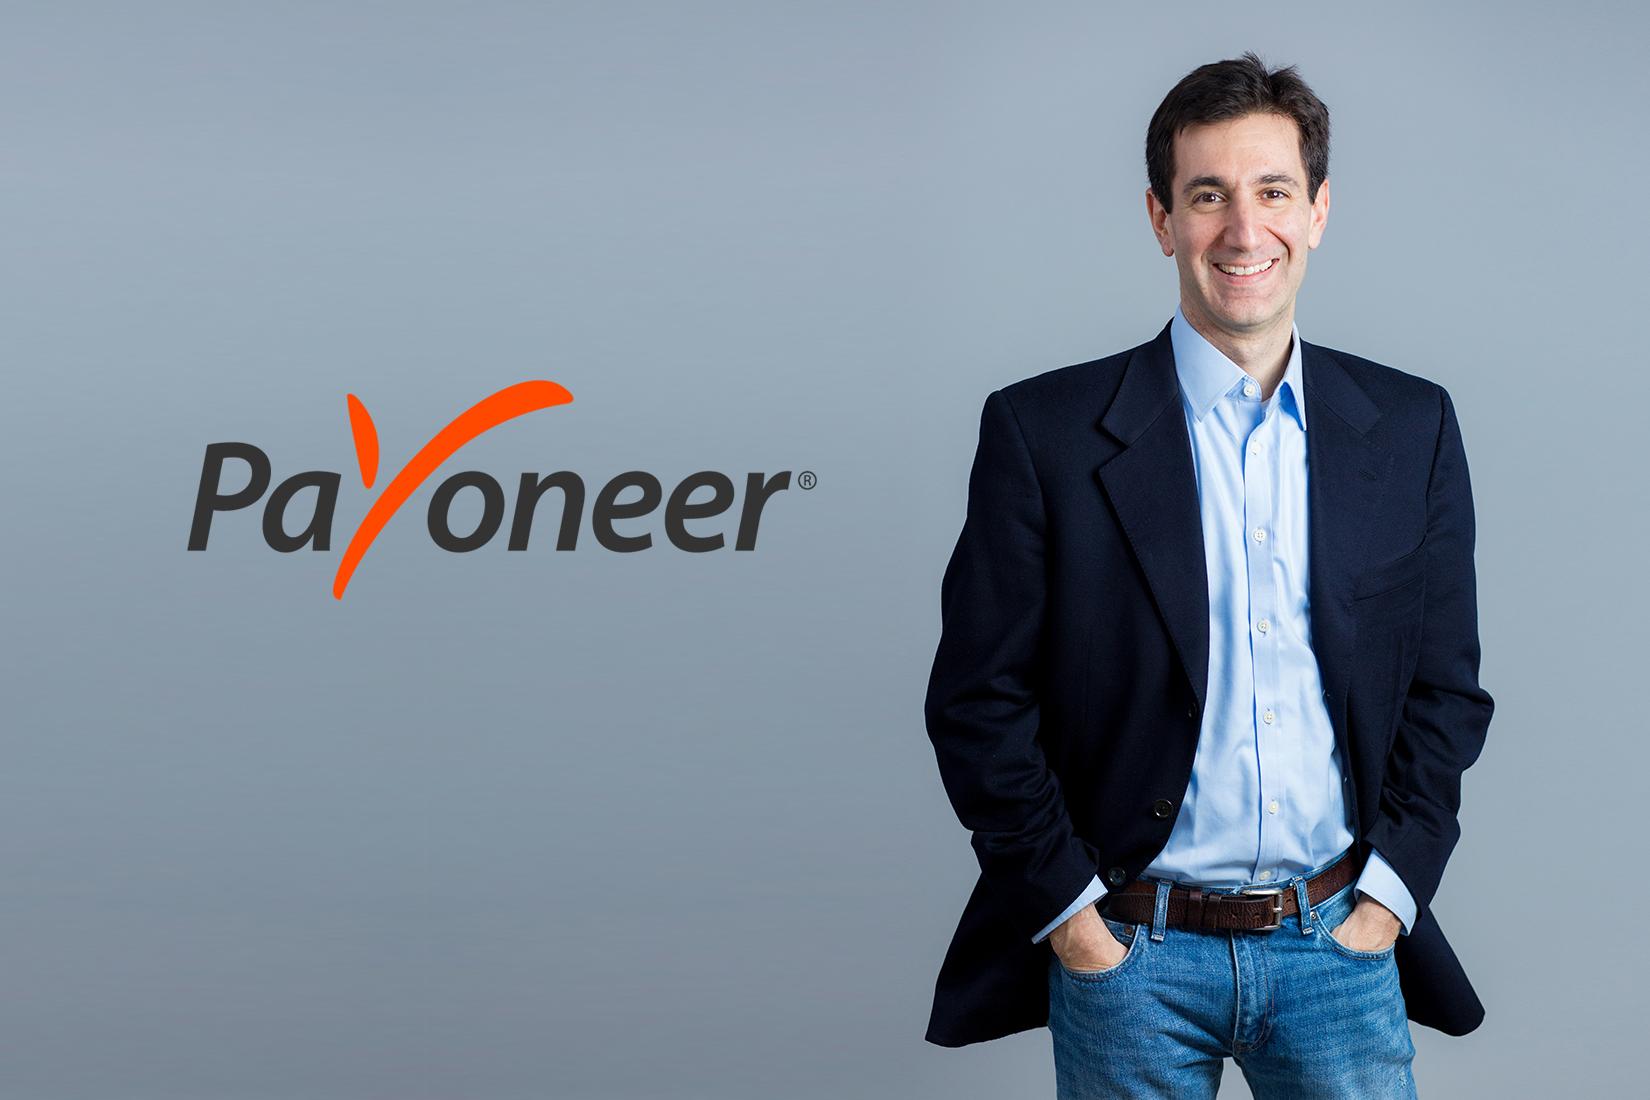 Payoneer's CEO Scott Galit